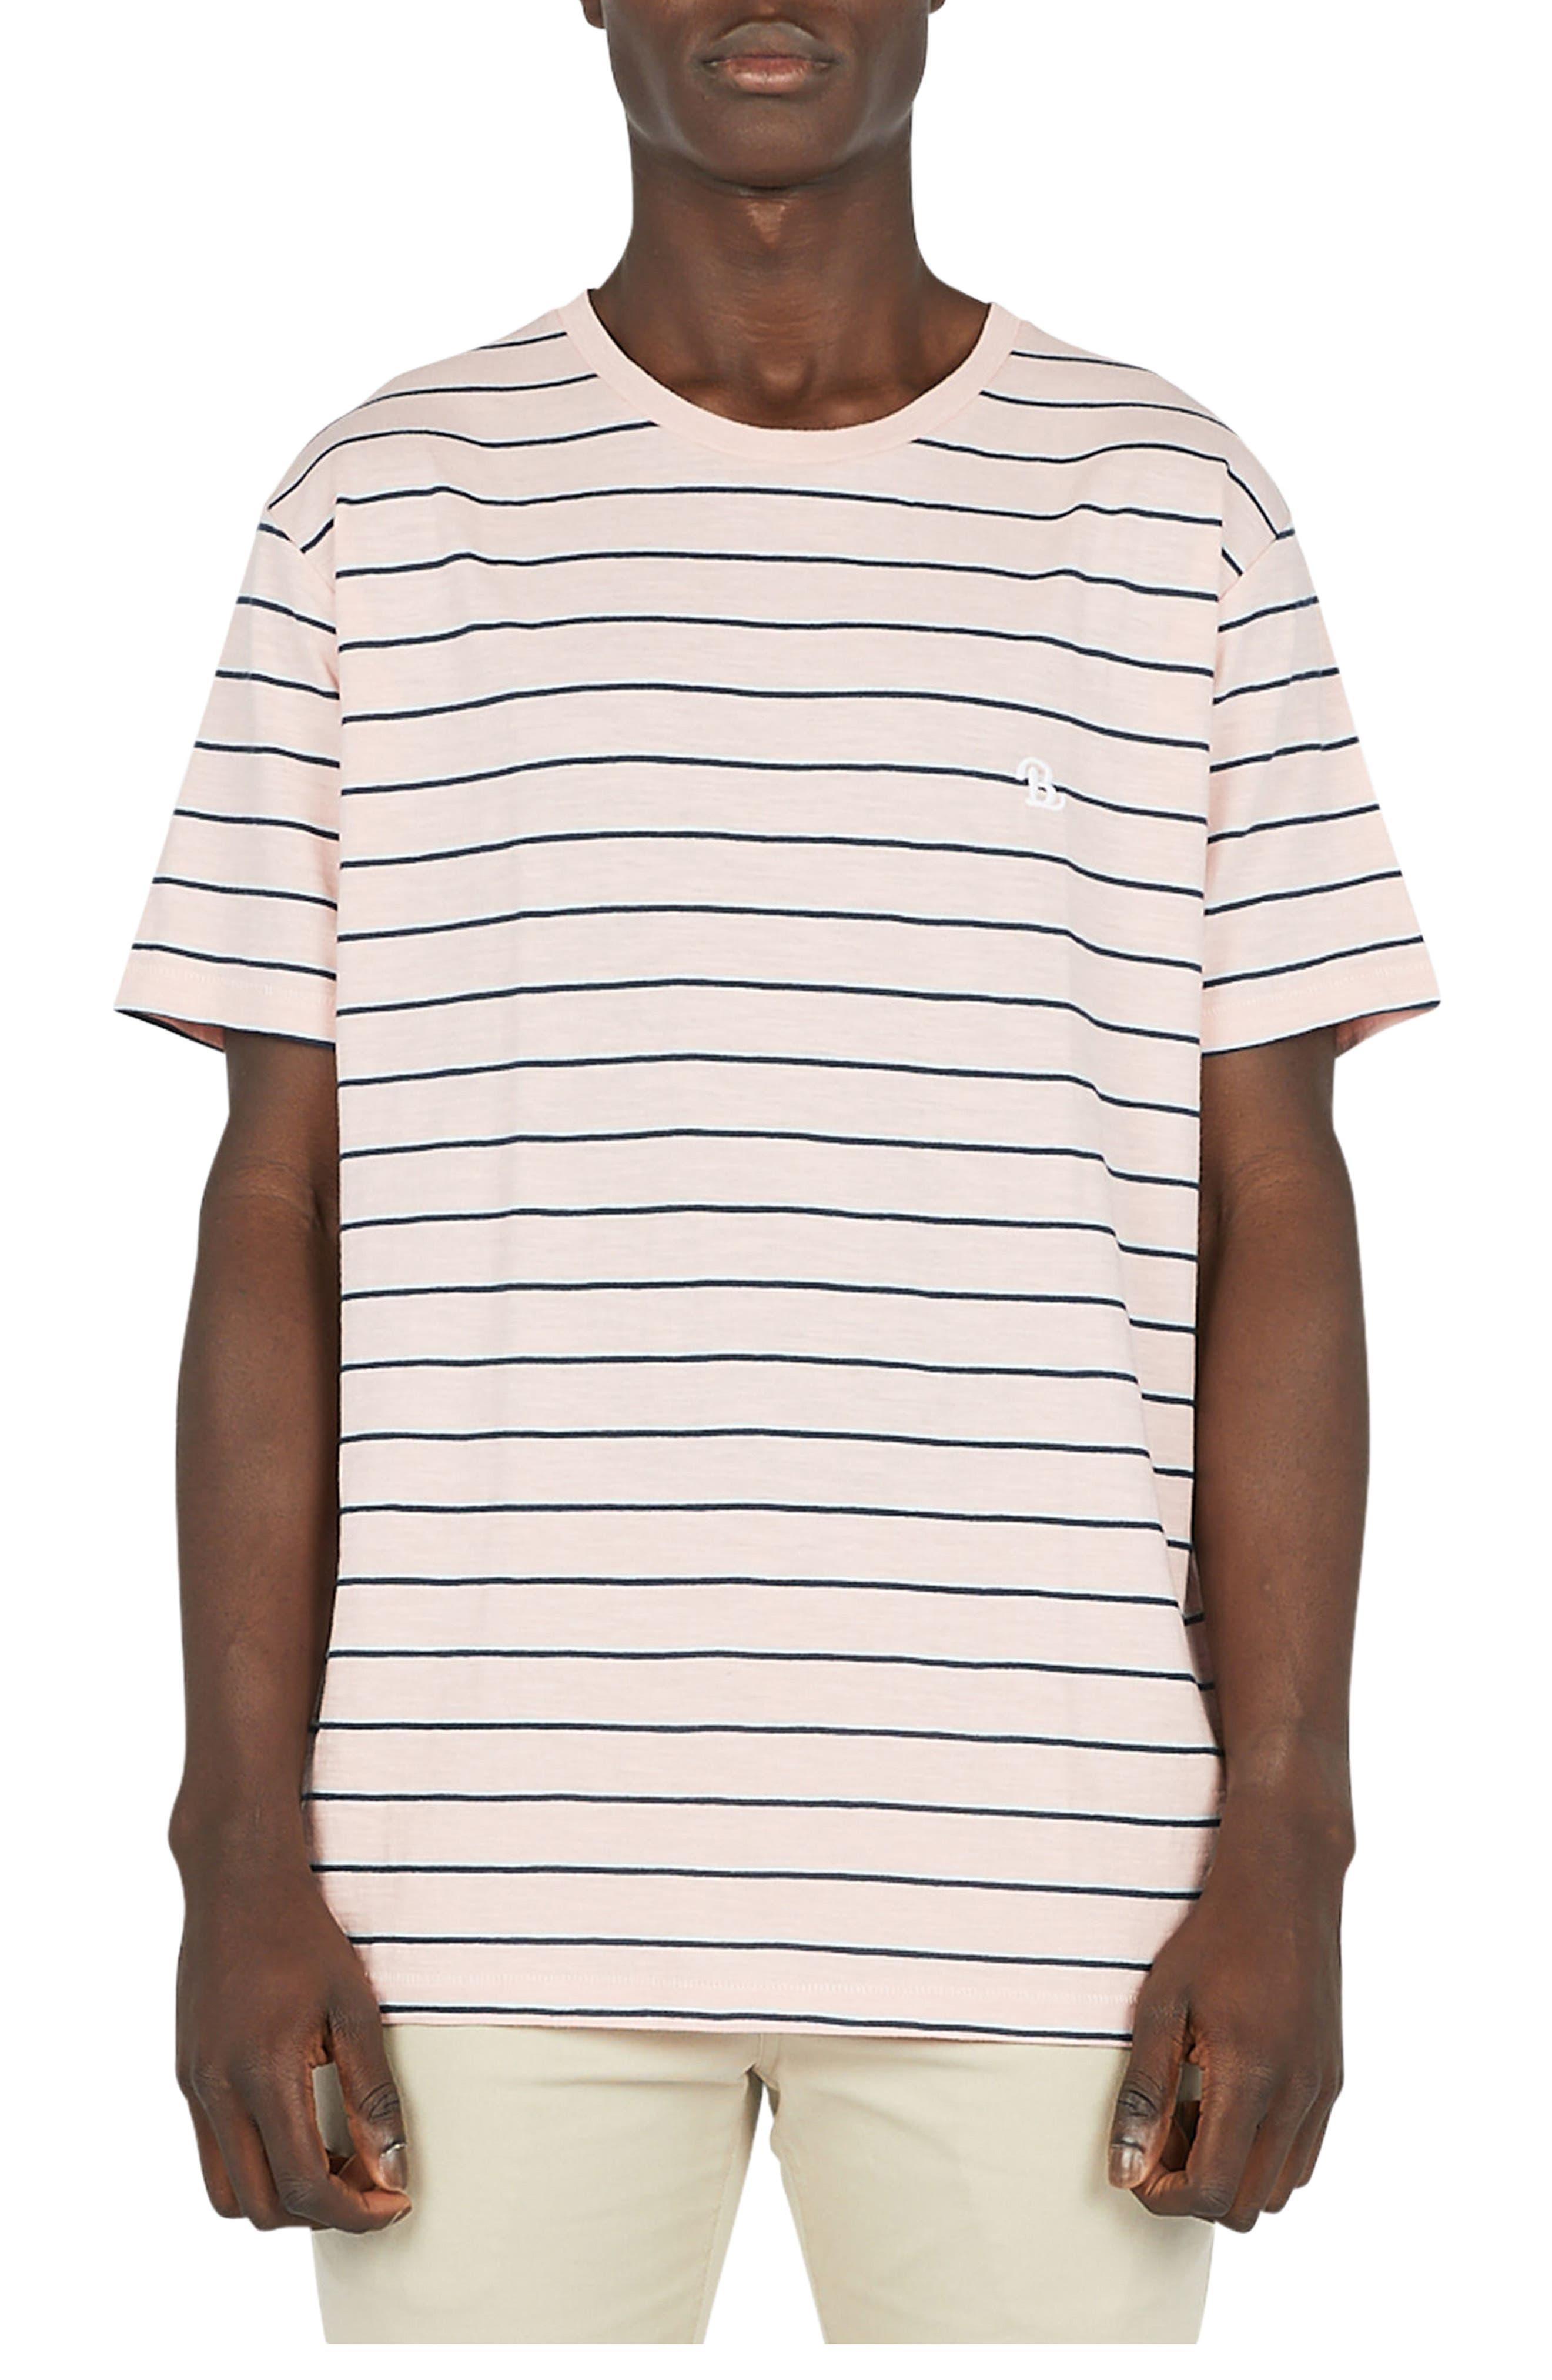 B.Schooled T-Shirt,                         Main,                         color, 682